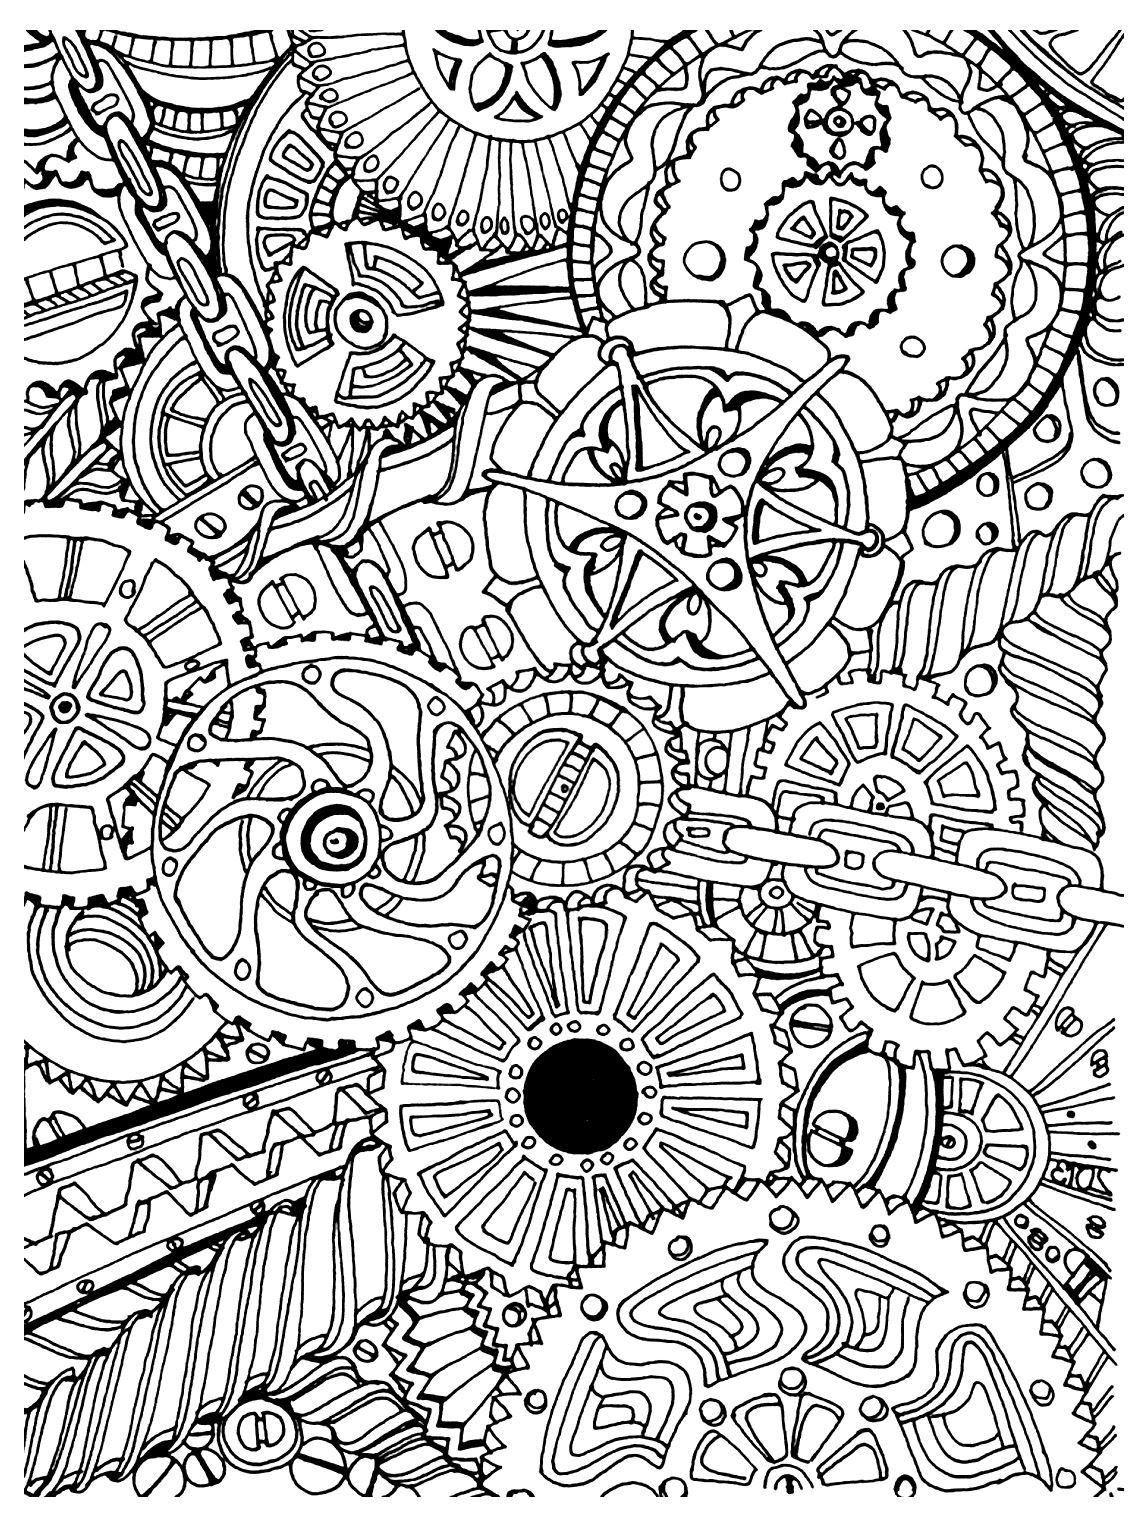 Pin Von Tanya Klestova Auf Paintings Pinterest